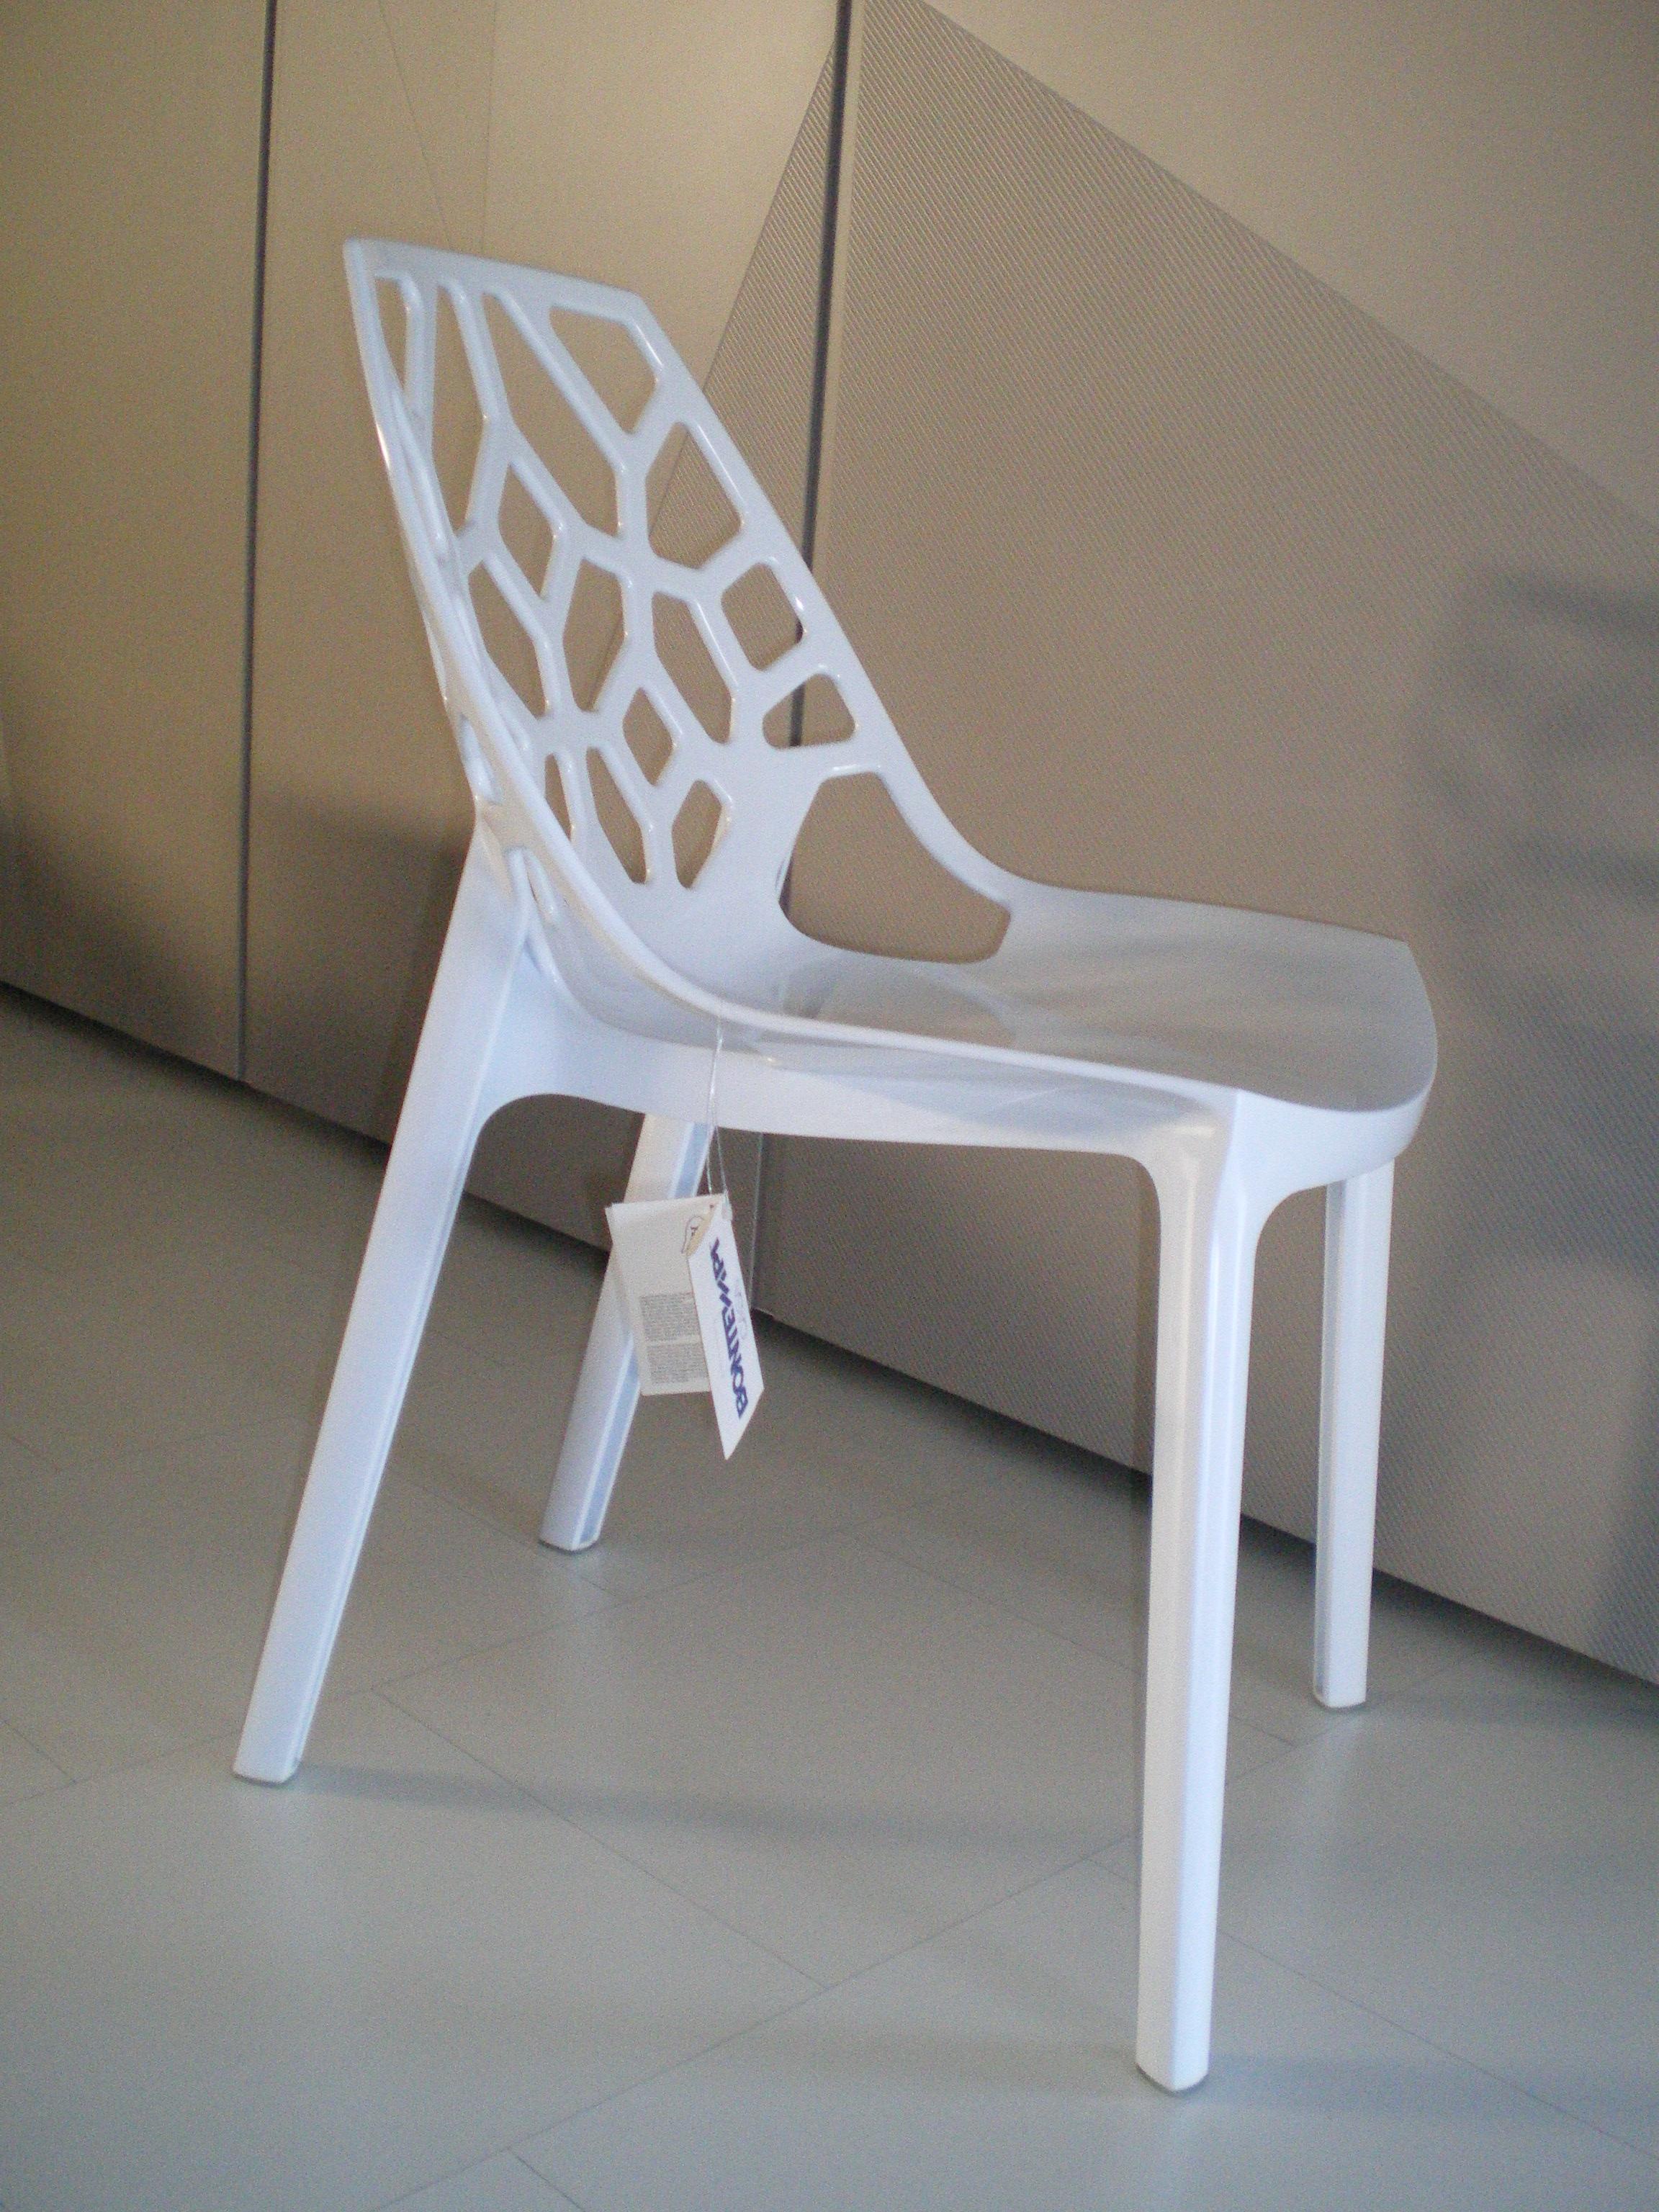 Sedie bontempi scontate sedie a prezzi scontati for Sedie design scontate